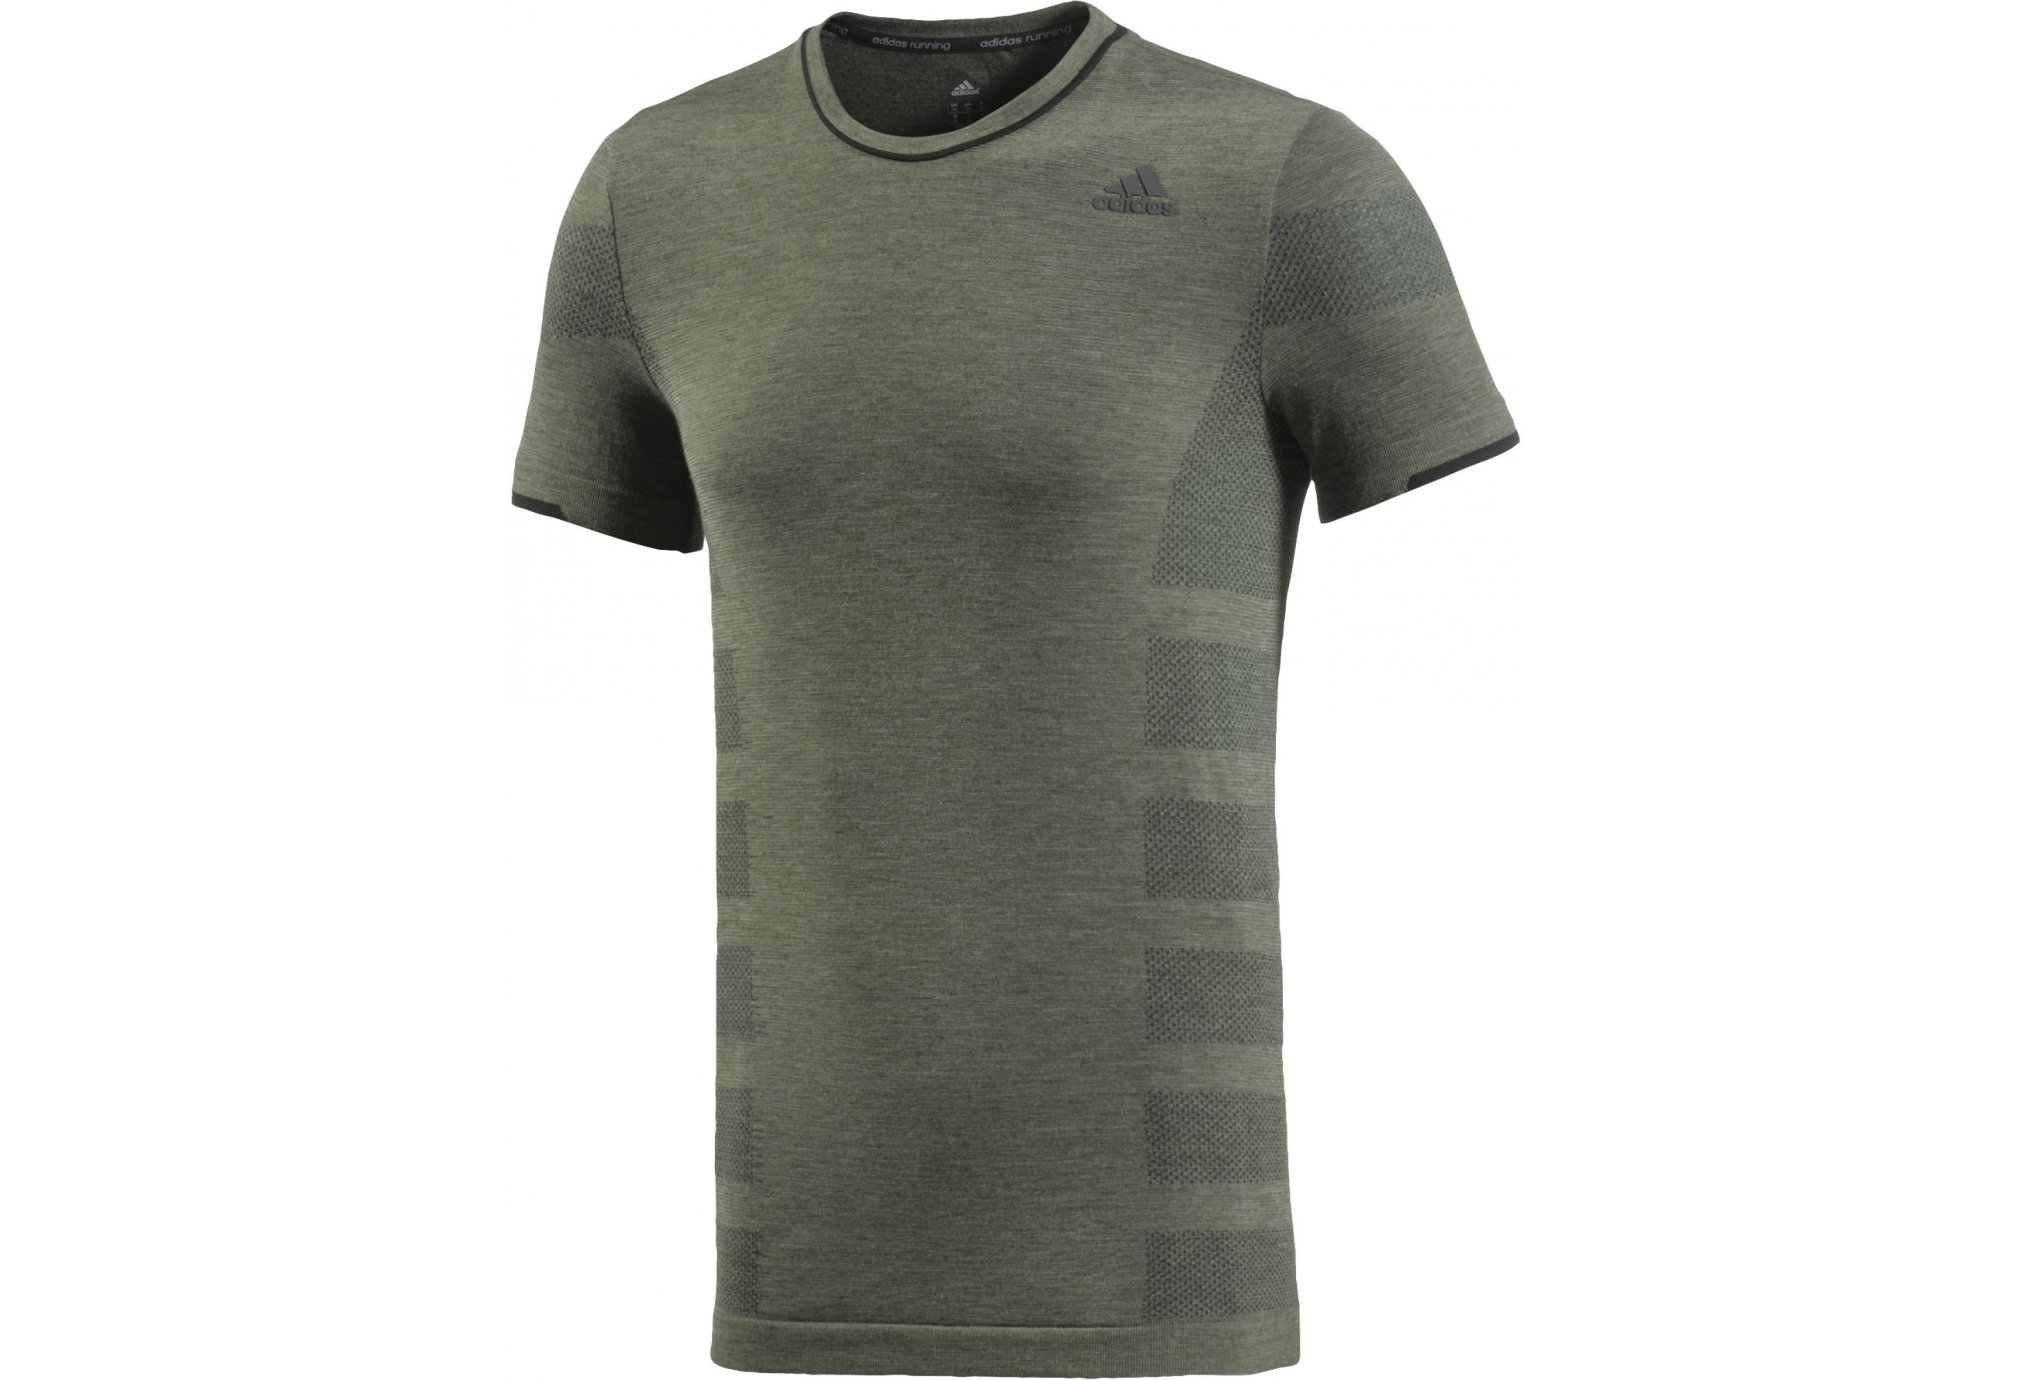 adidas Tee-shirt adistar Primeknit M Diététique Vêtements homme